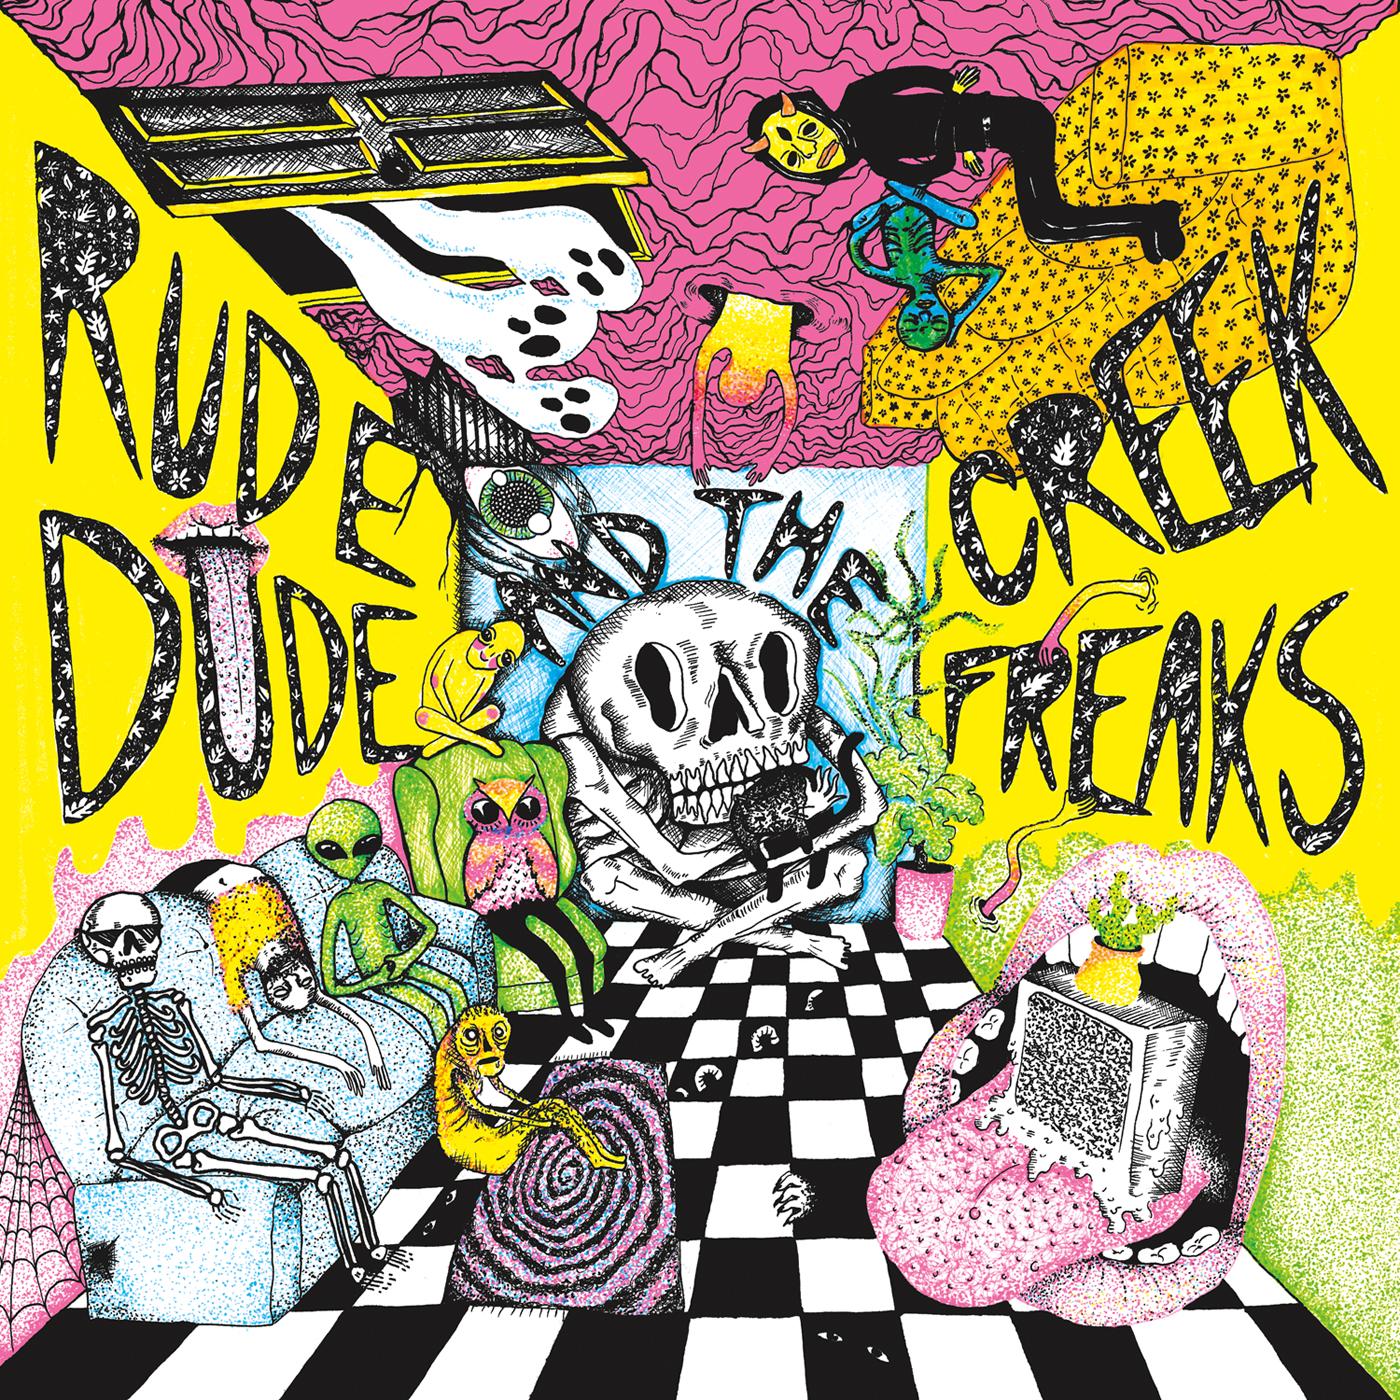 rude dude and the creek freaks - self-titled